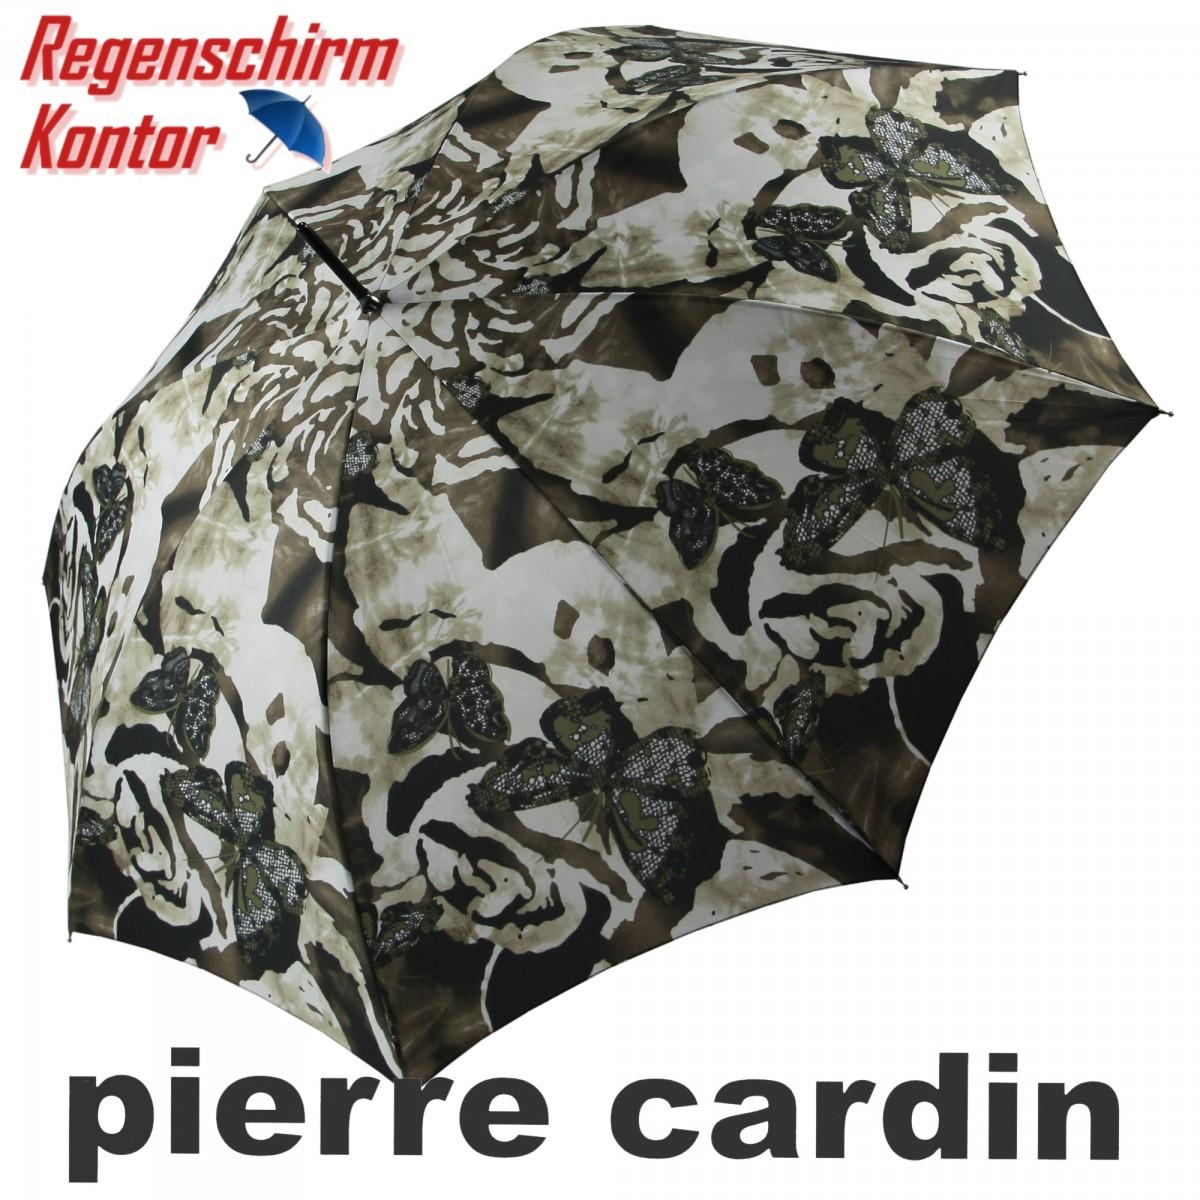 Pierre Cardin Regenschirm Damen Stockschirm Brauntöne Pierre Cardin